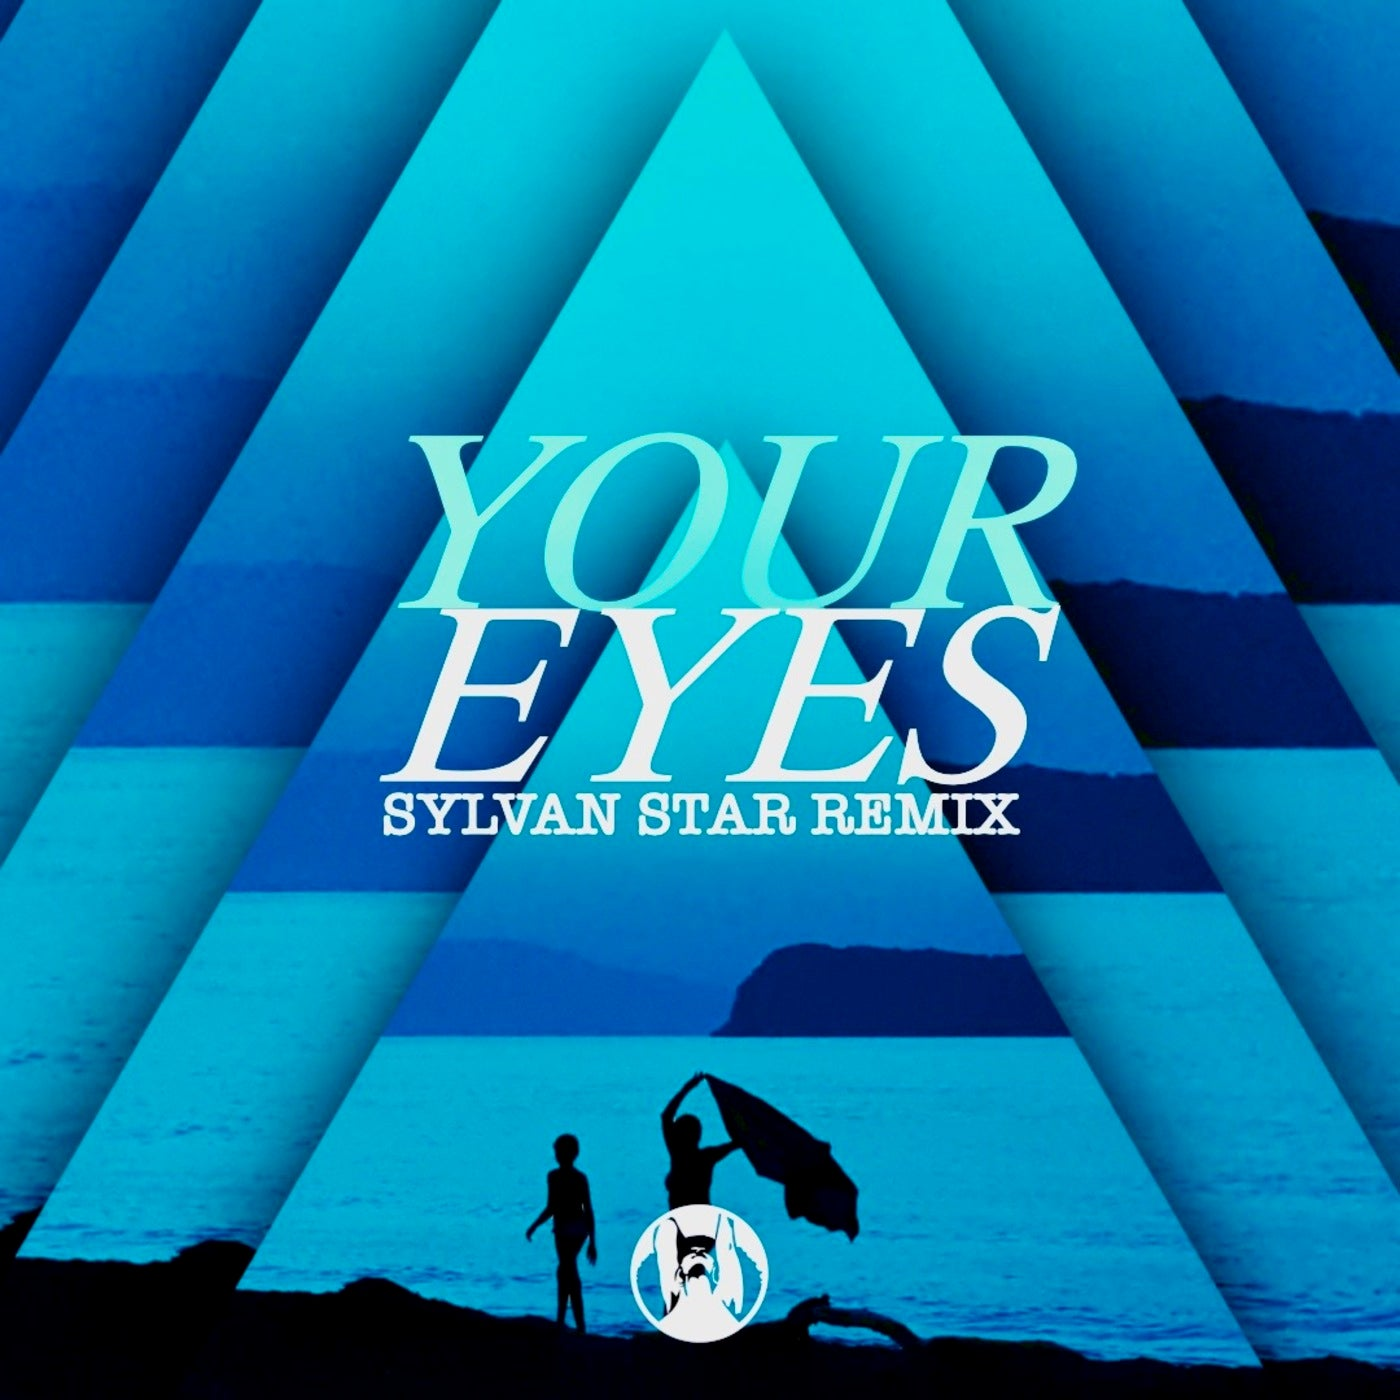 Your Eyes (Sylvan Star Remix)